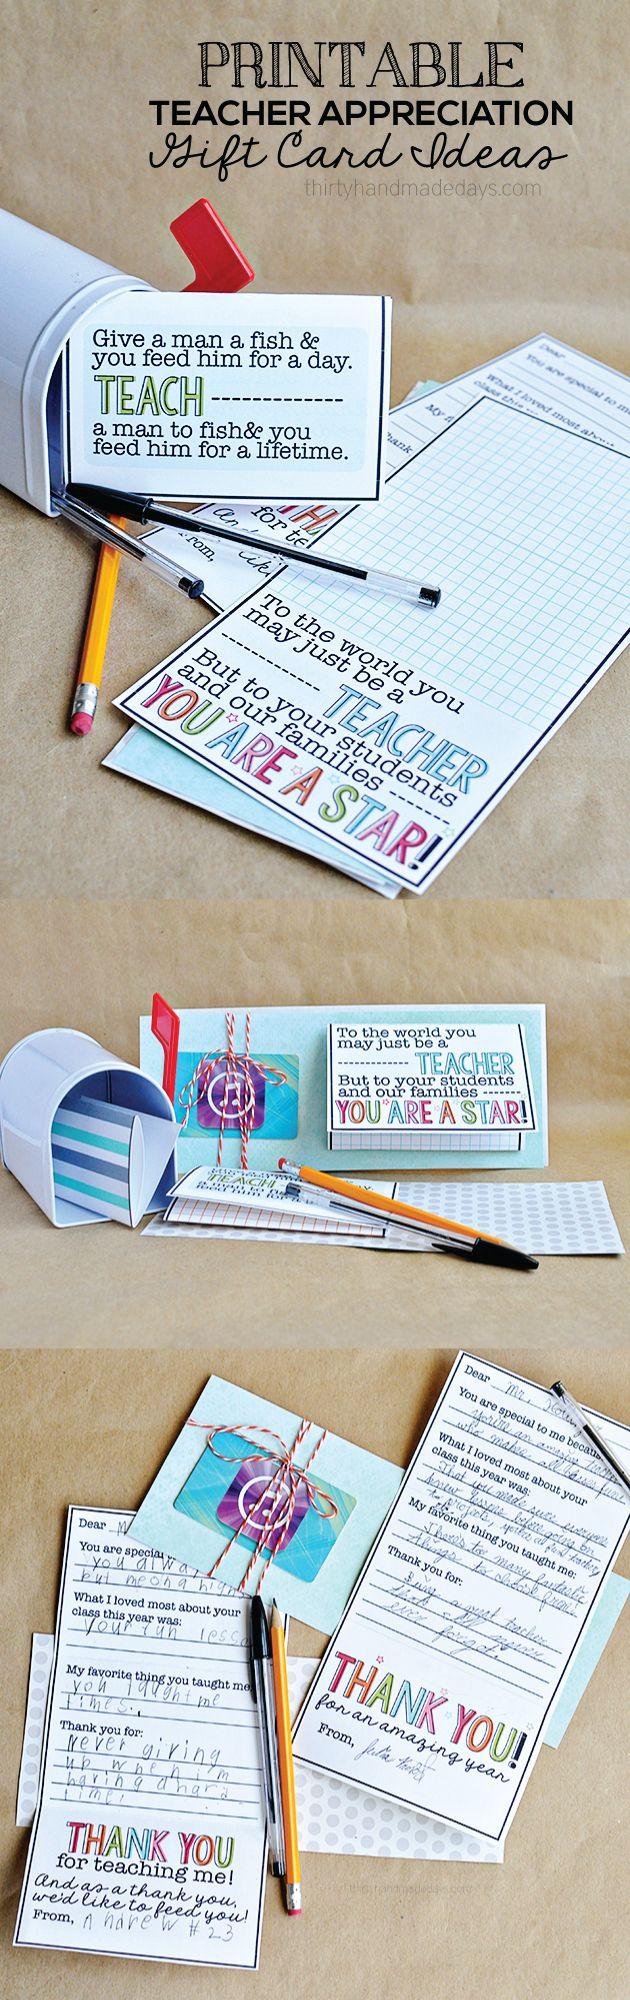 Diy Gifts Teacher Appreciation Gift Idea Print This Gift Card